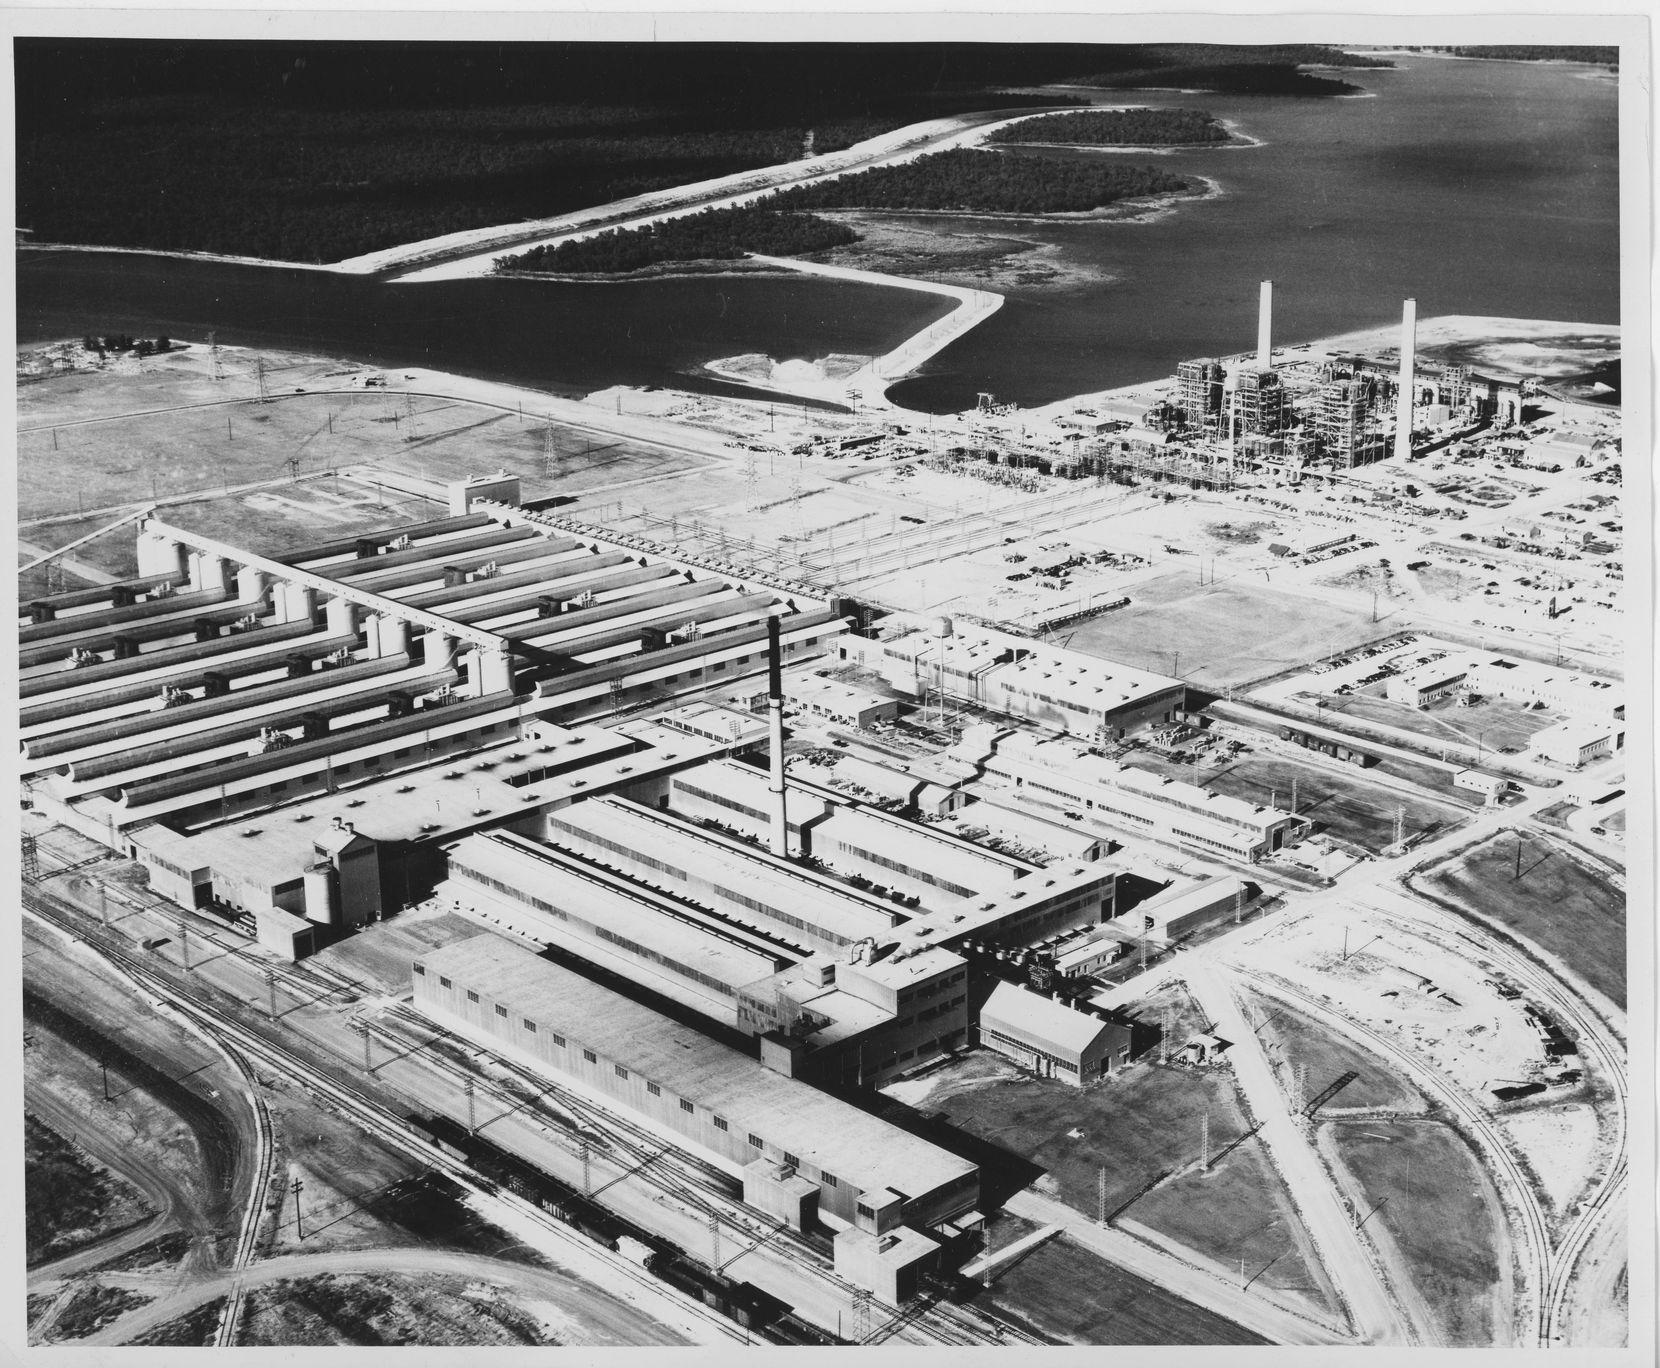 DMN file photo of the Alcoa Rockdale aluminum plant from November 1952